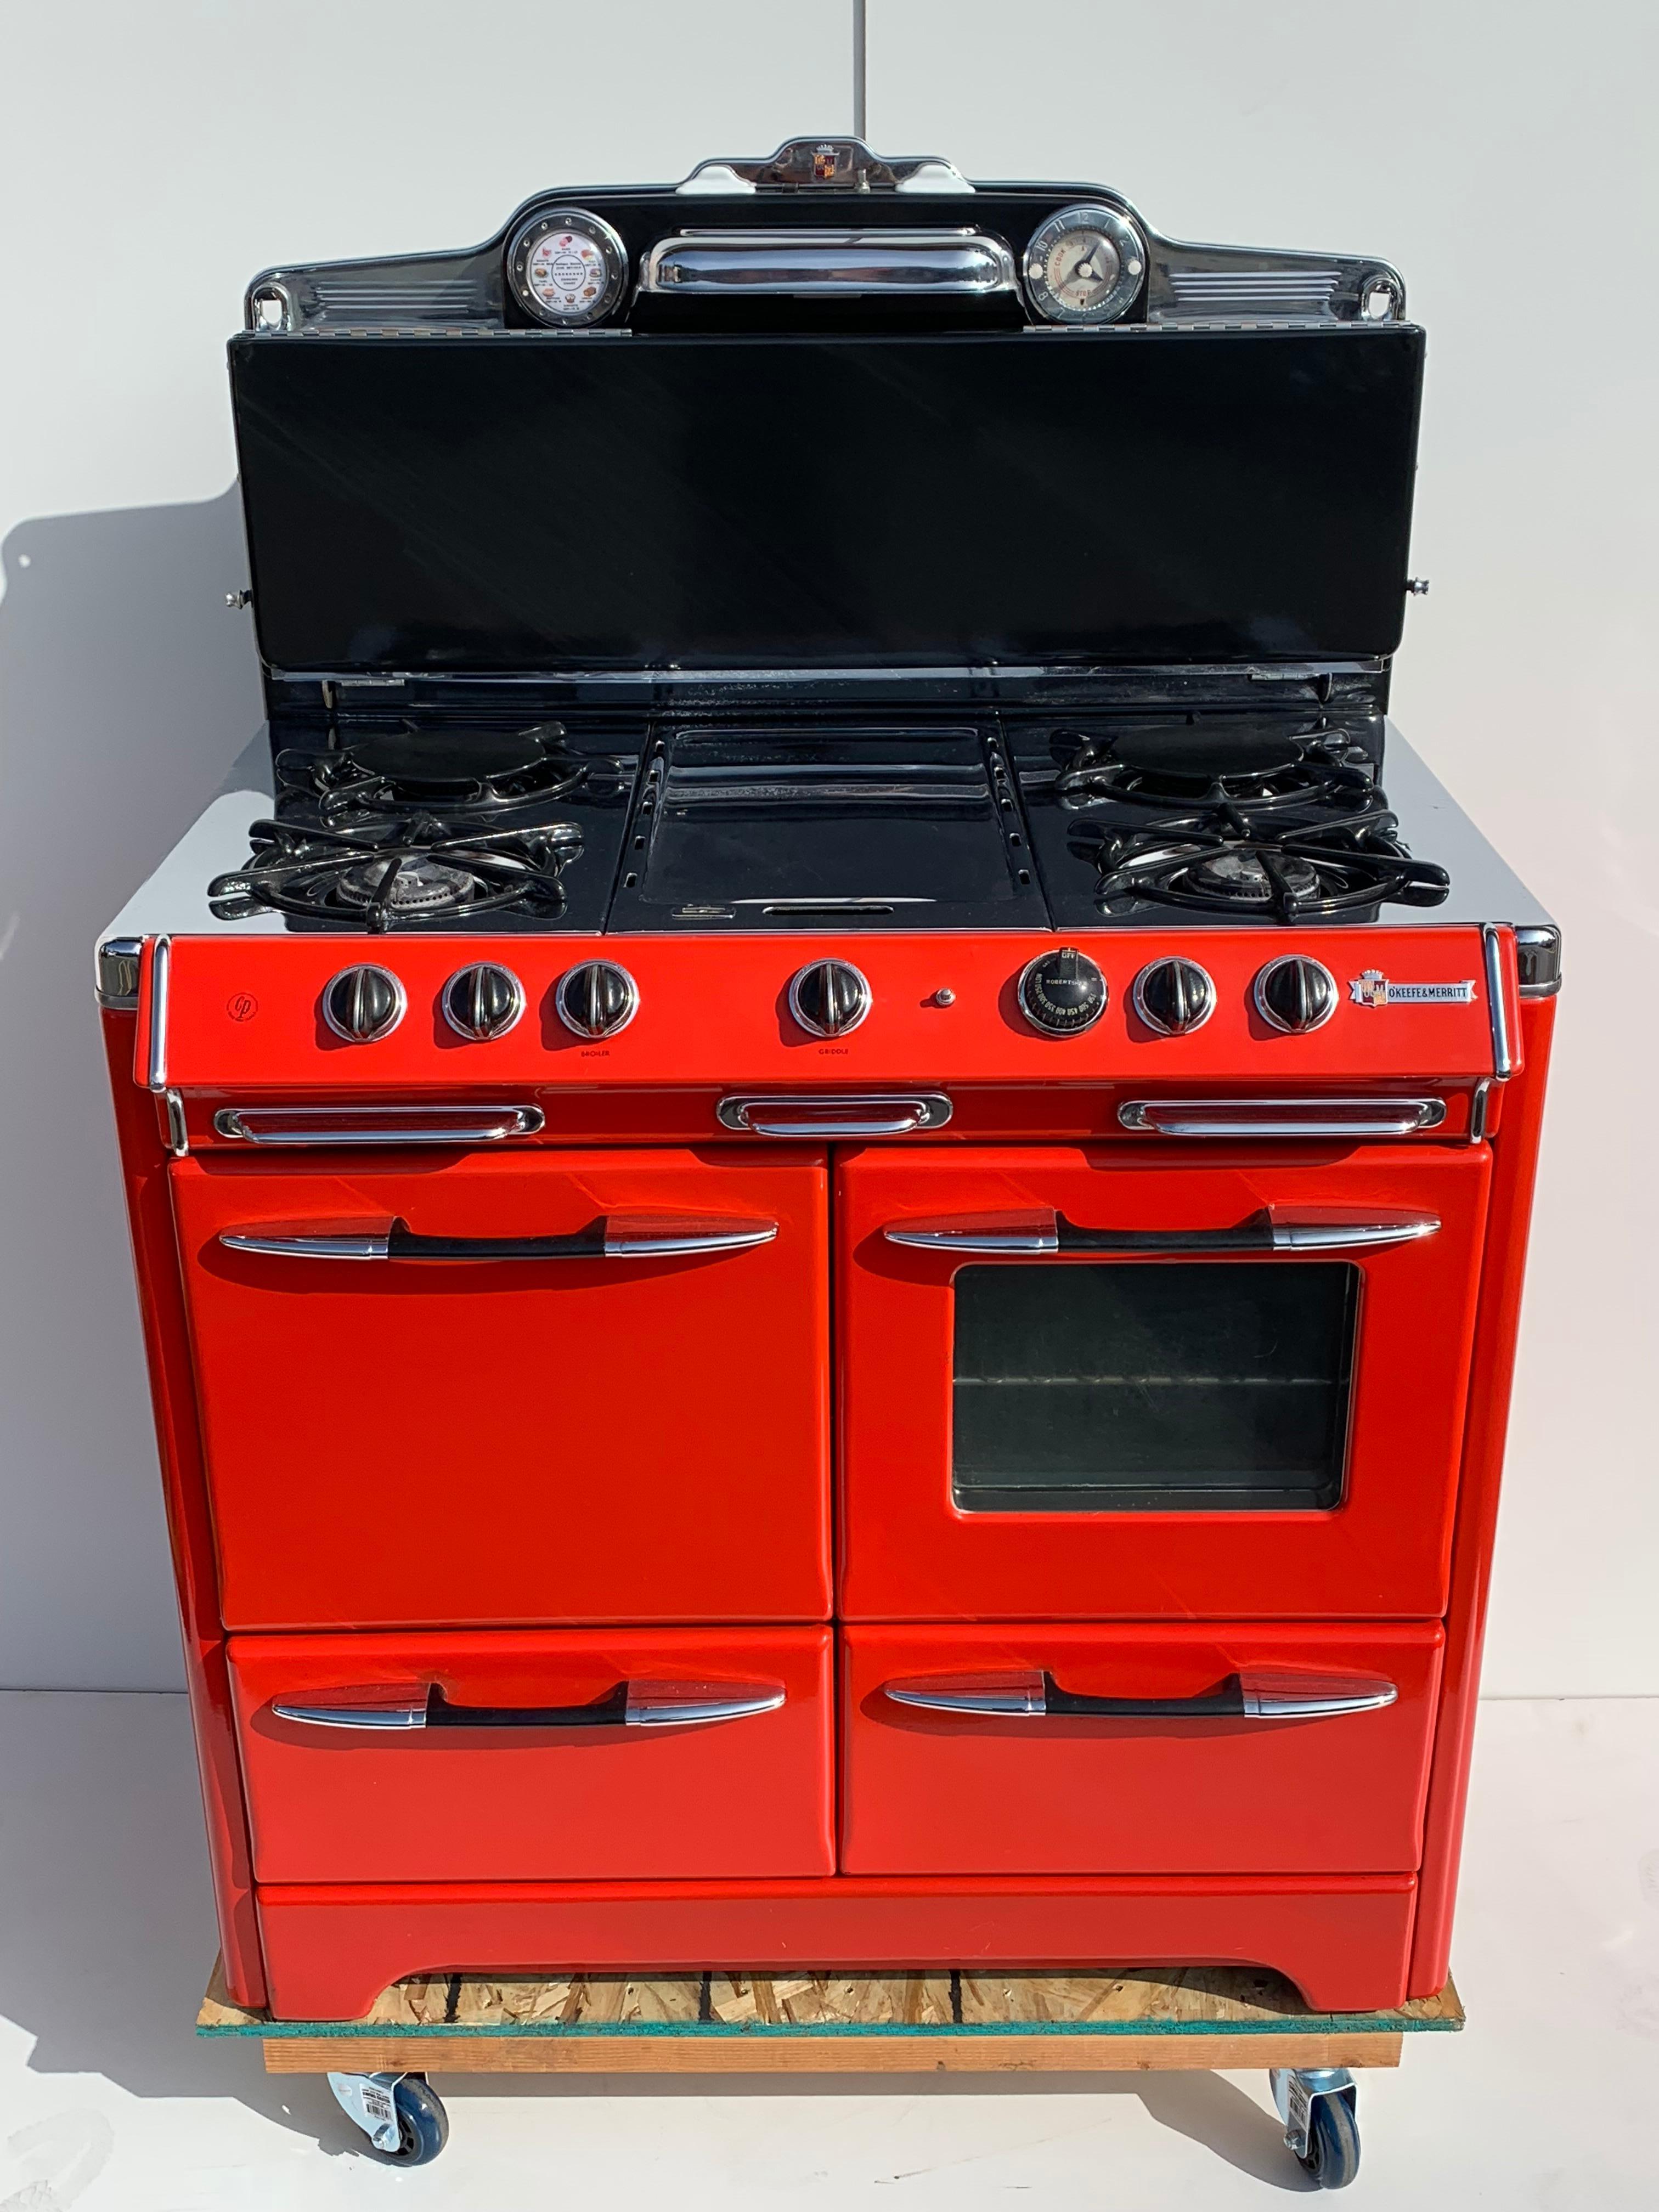 1950 gas stove wiring diagram wiring diagram rh 4 fomly be